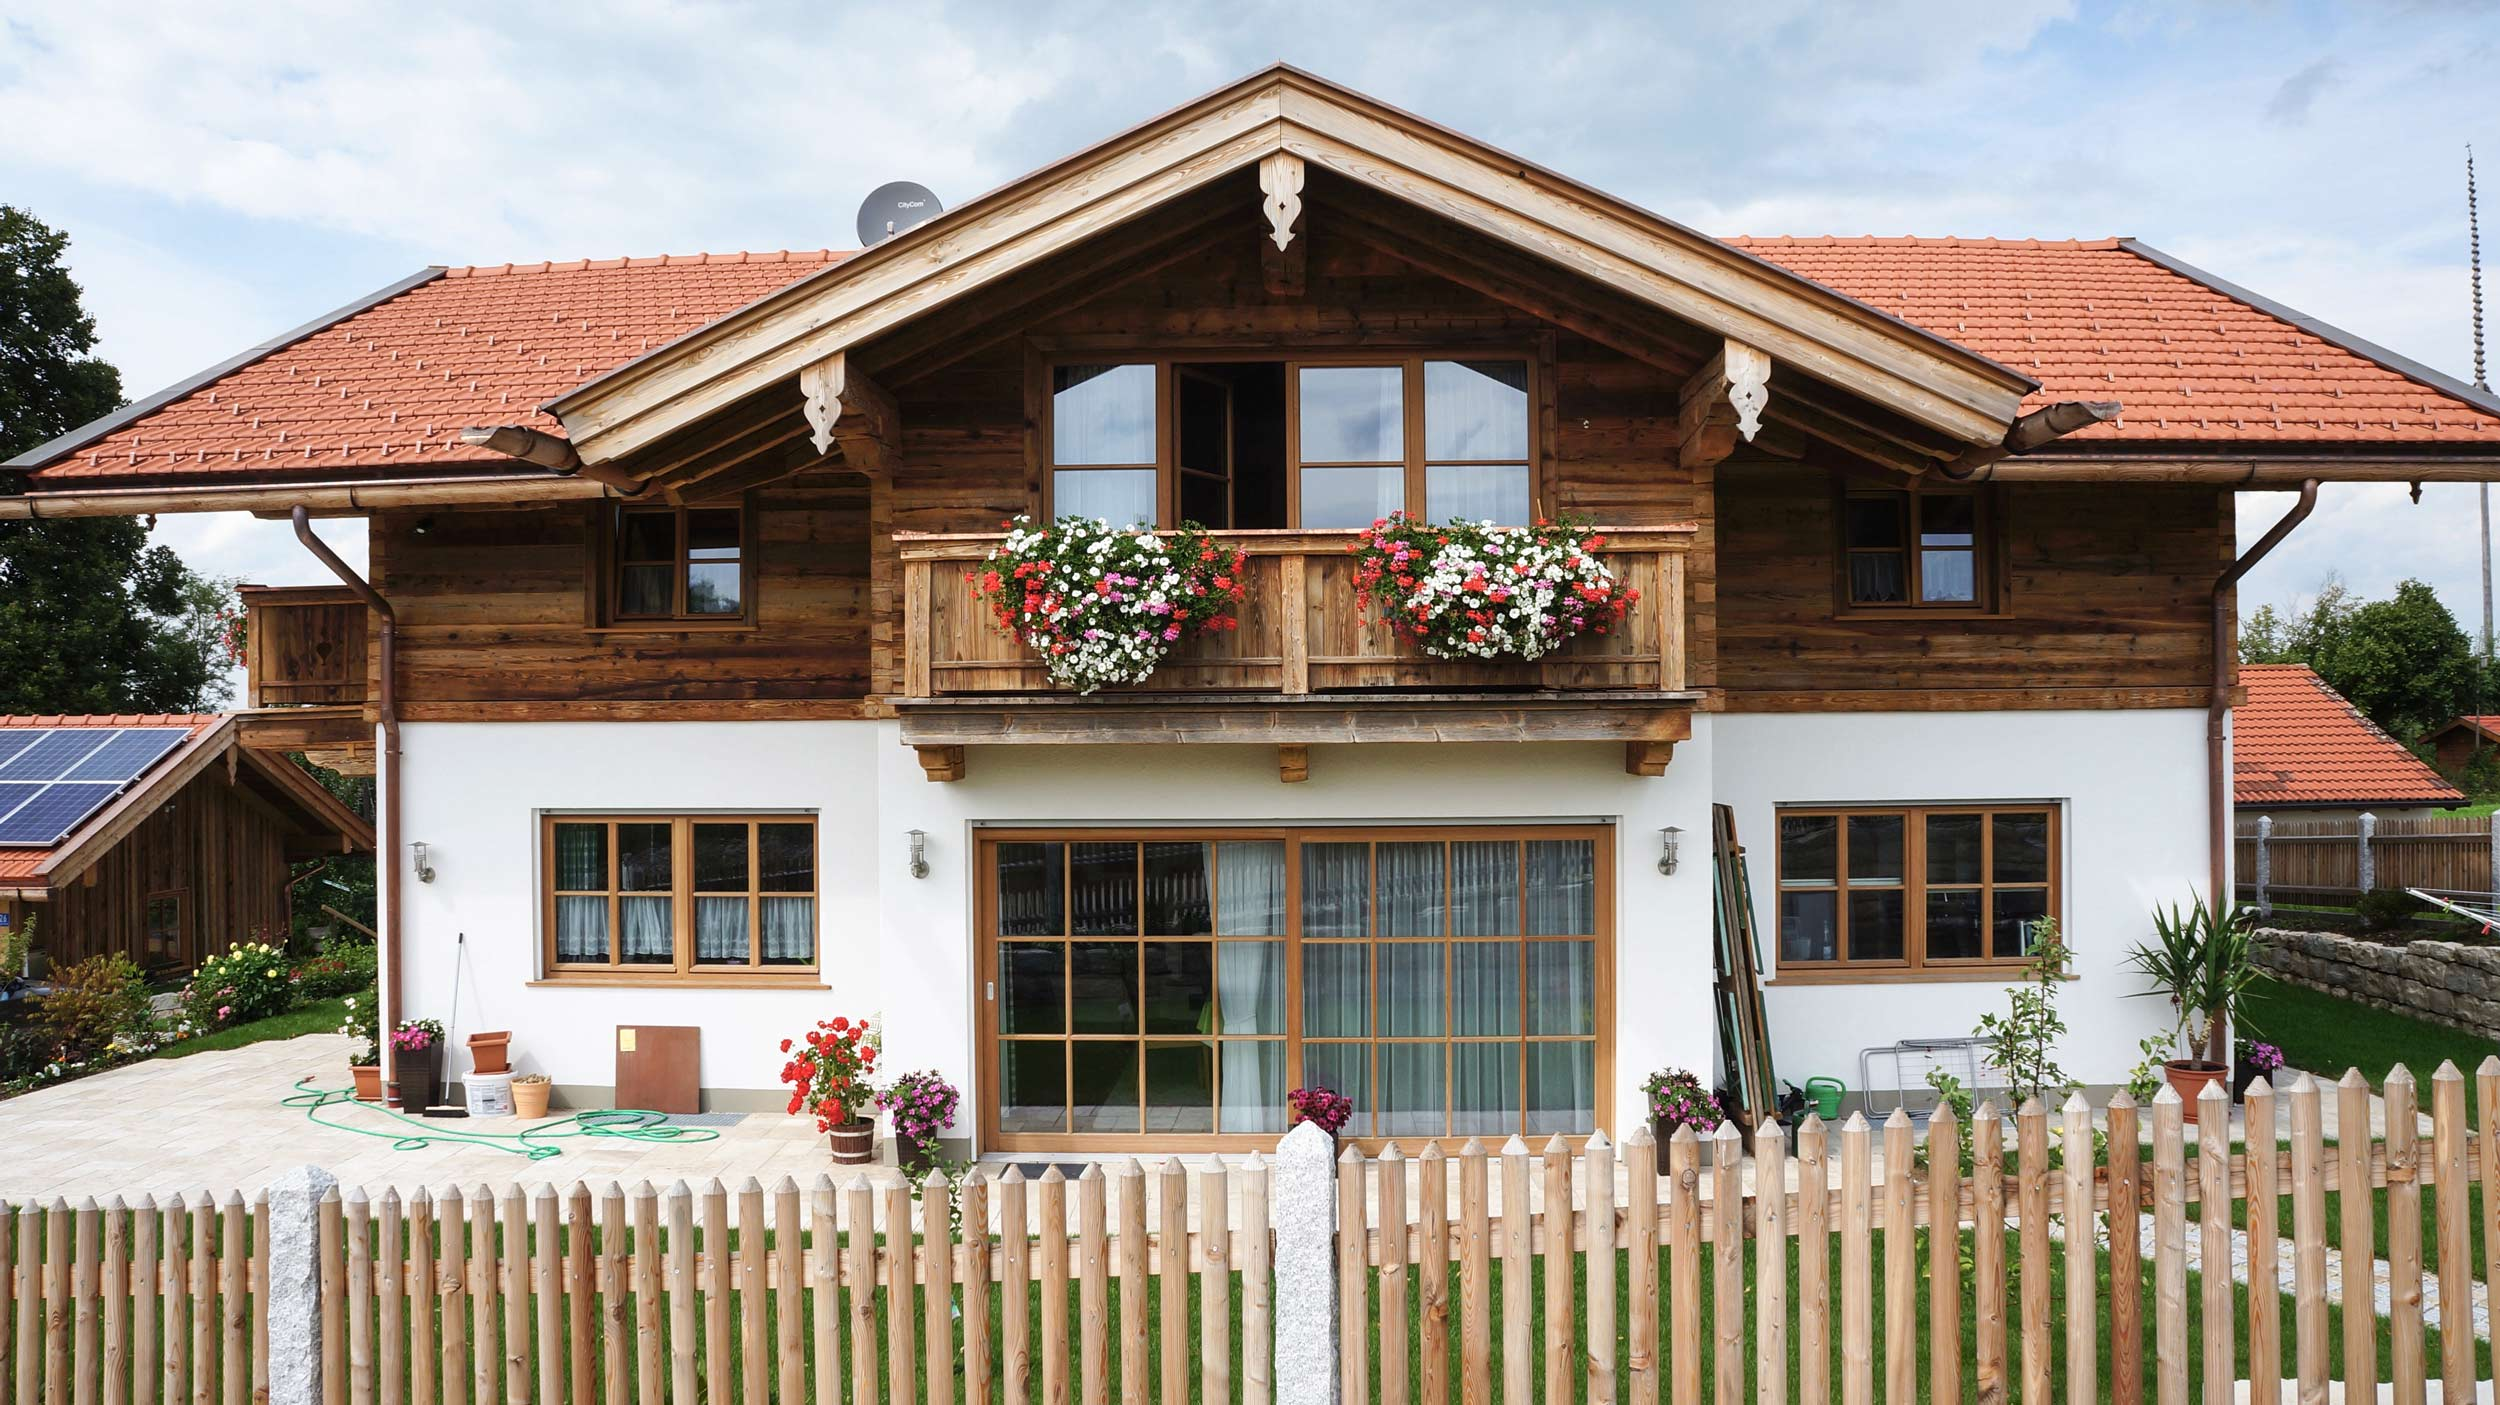 zimmerei-stoib-holzbau-holzhaus-altholz-fassade-blockschalung-balkon-dachstuhl-zaun-quergiebel-terrassentür-02.jpg